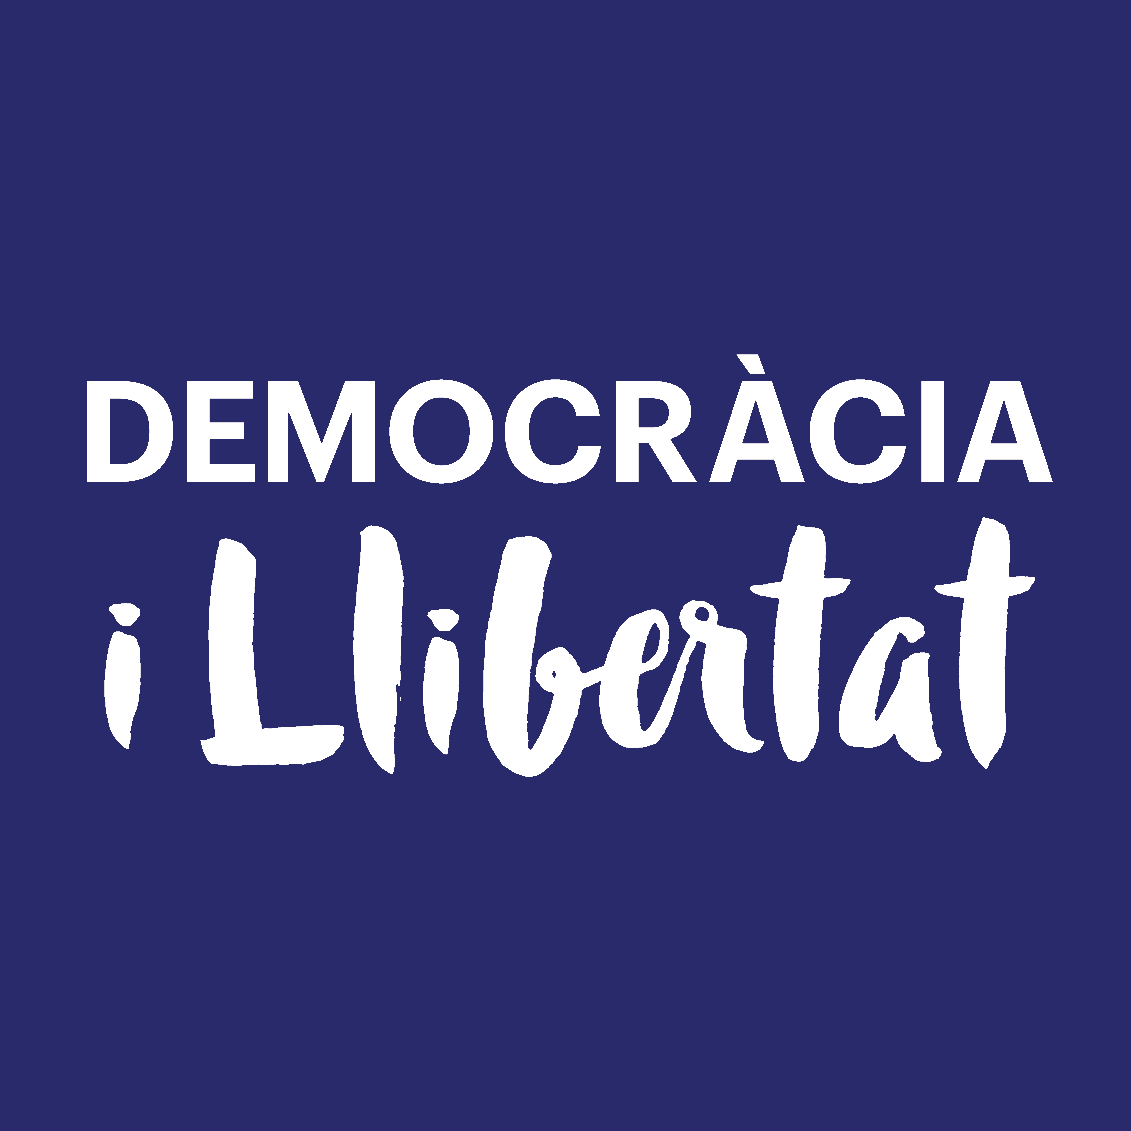 [XI Legislatura] 1ª Sesión del Debate de Investidura de Dña. Soraya Sáenz de Santamaría Antón Democracia_i_Llibertat